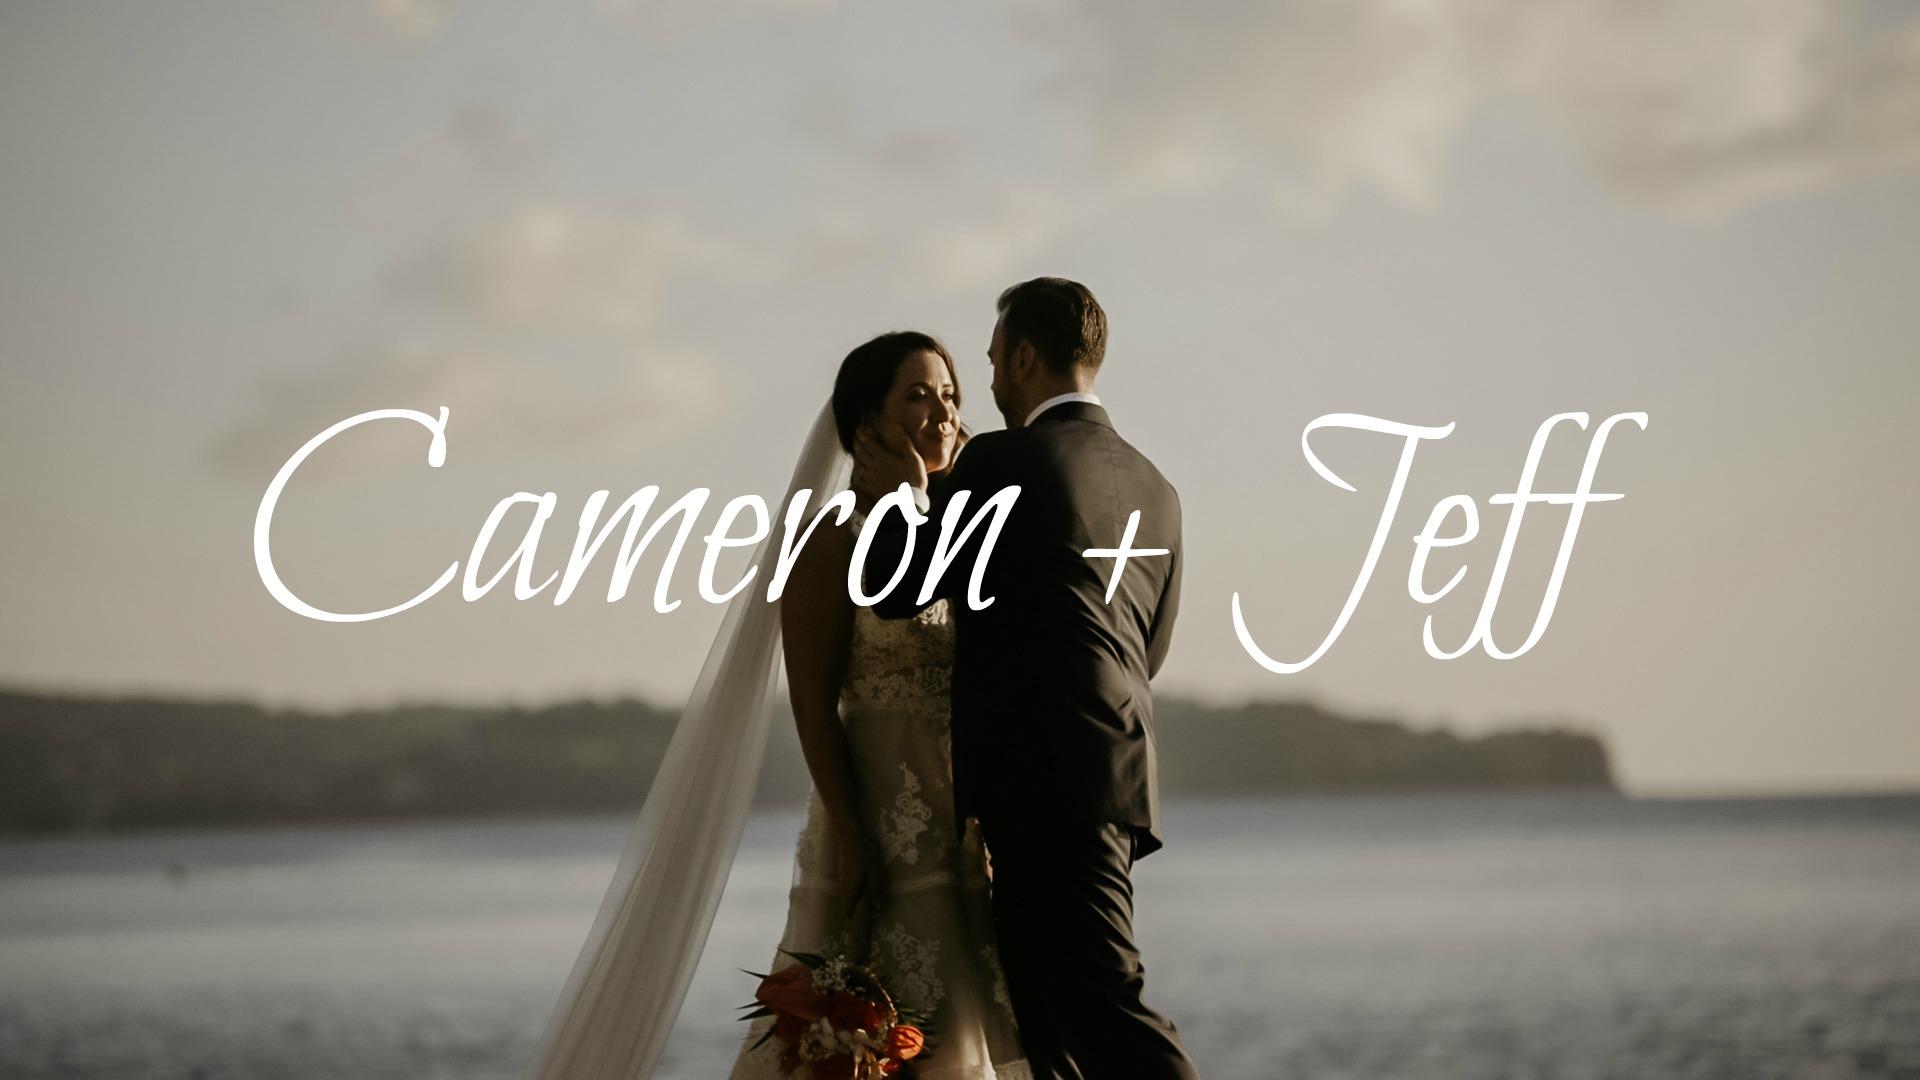 Cameron + Jeff | Labrelotte Bay, Saint Lucia | Labrelotte Bay Labrelotte Bay Castries, St Lucia